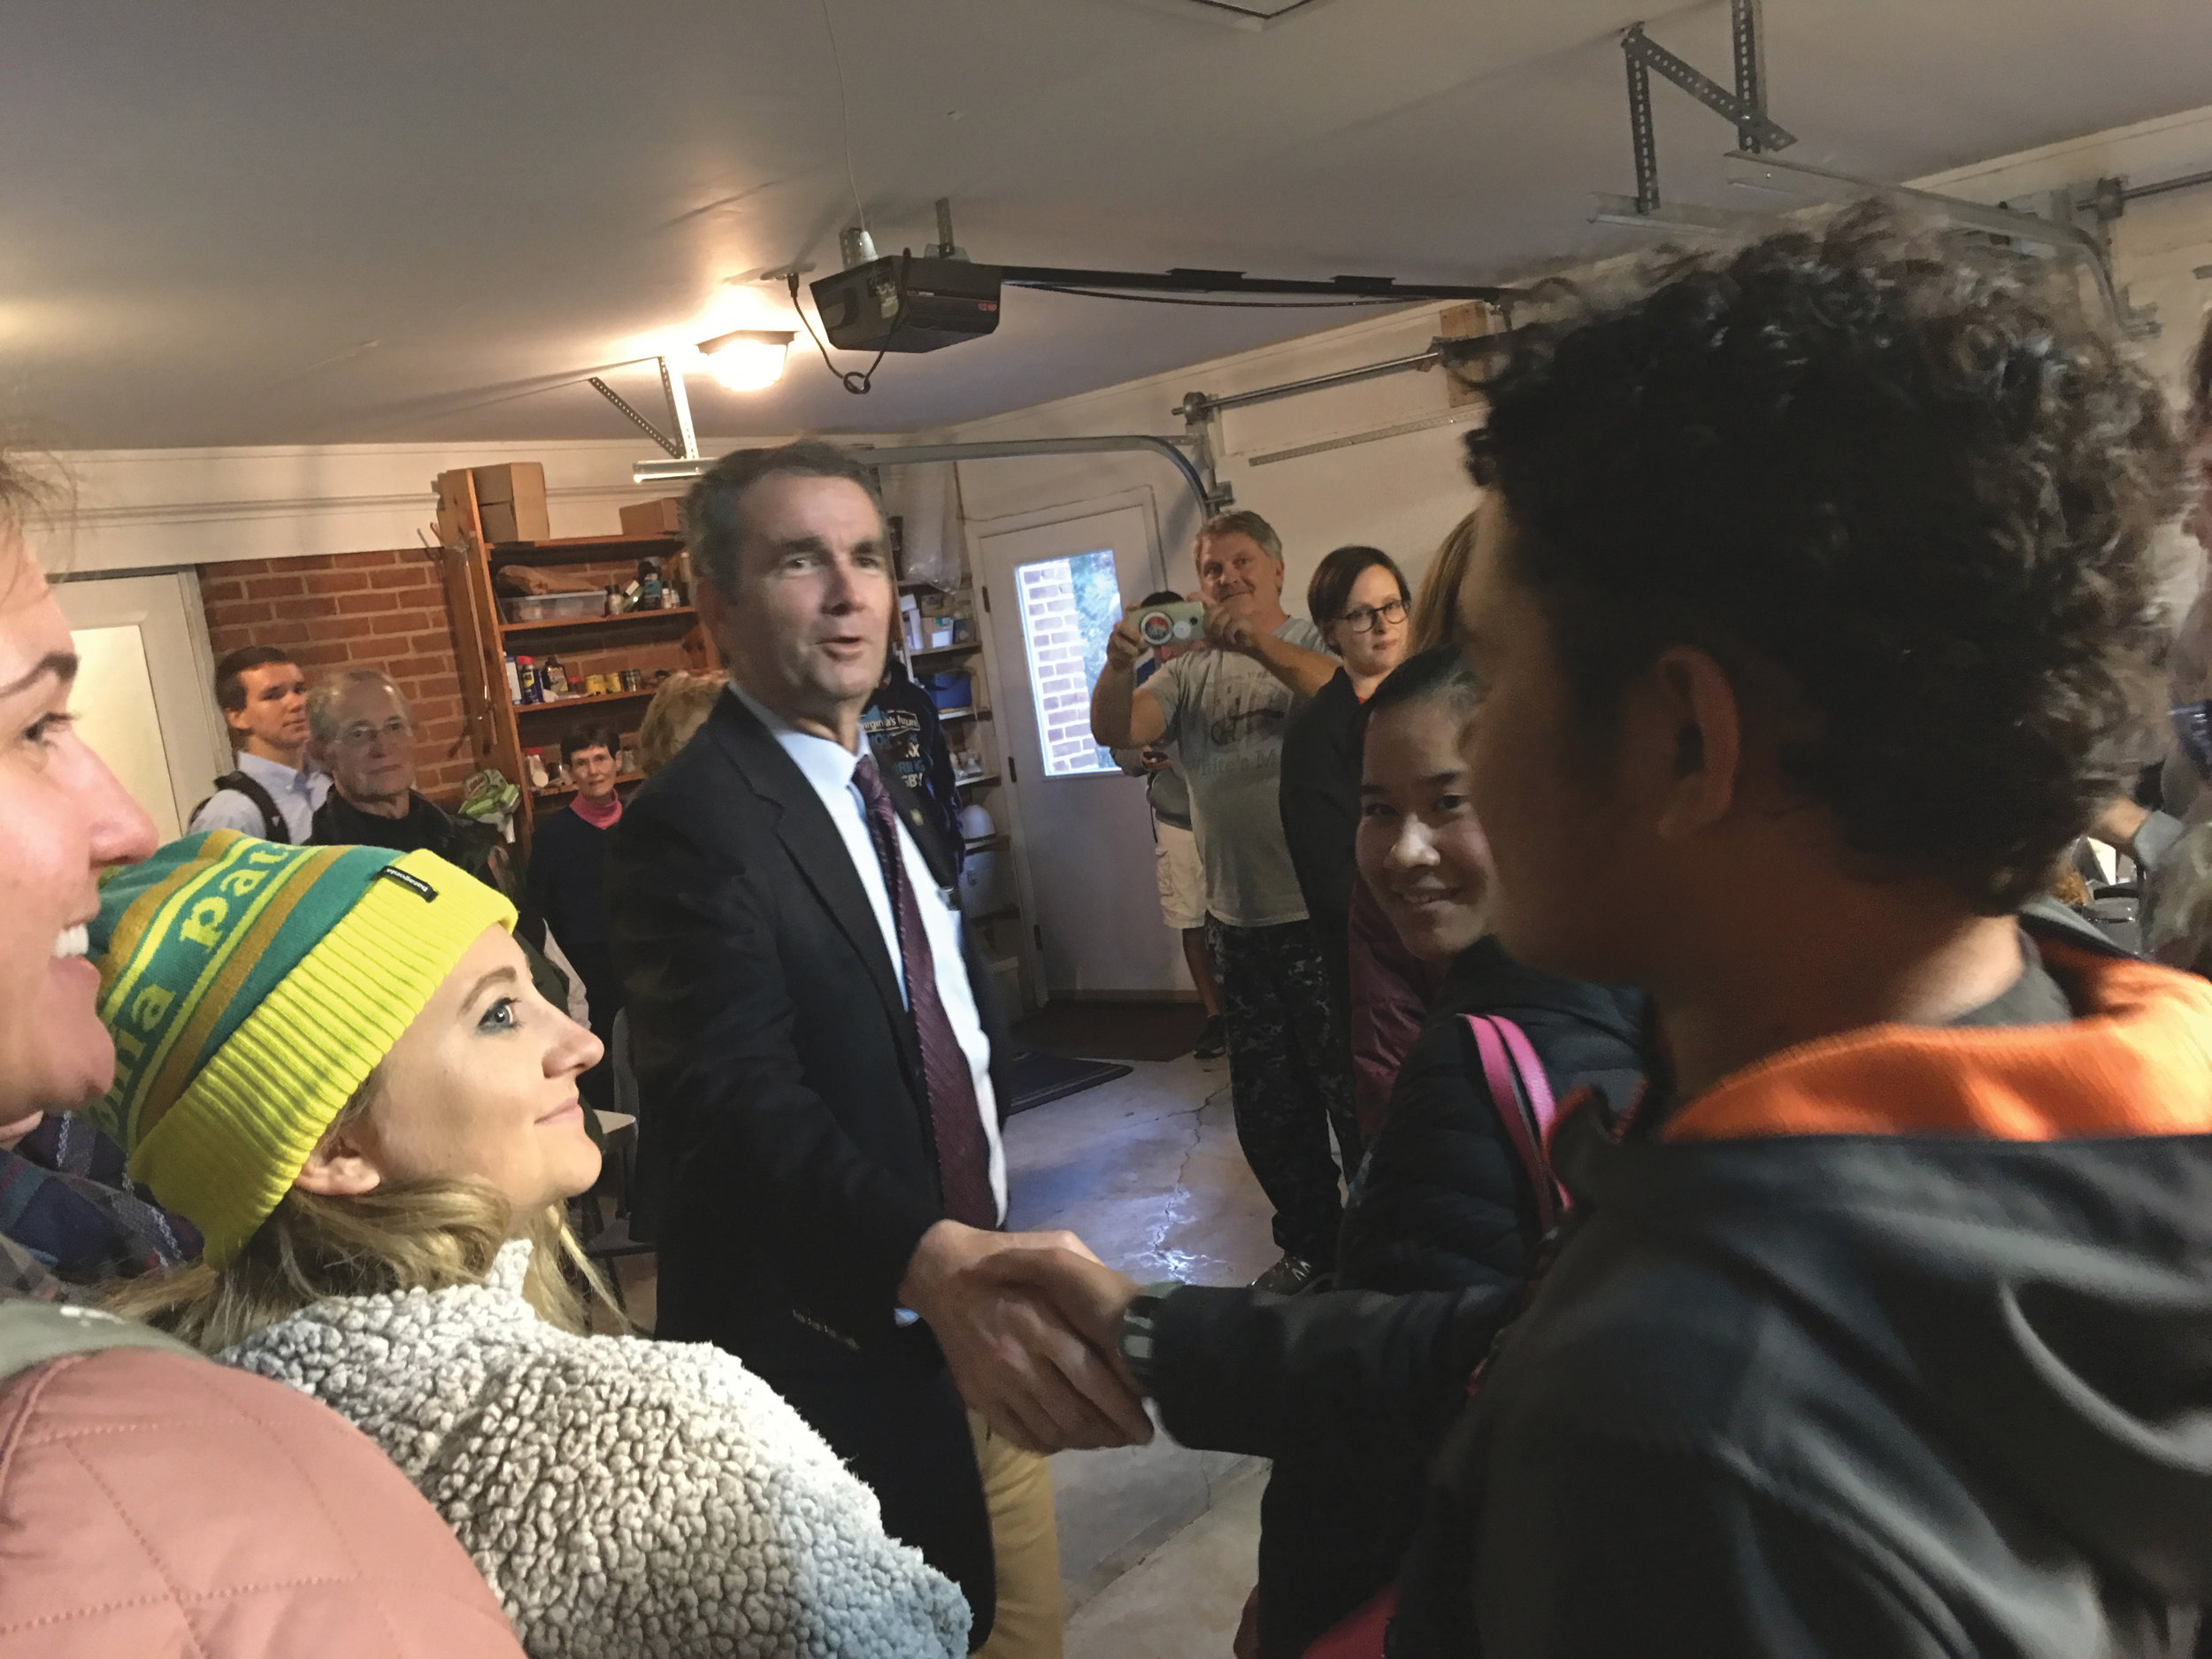 Ralph Northam meeting with volunteers in Blacksburg, VA (2017).